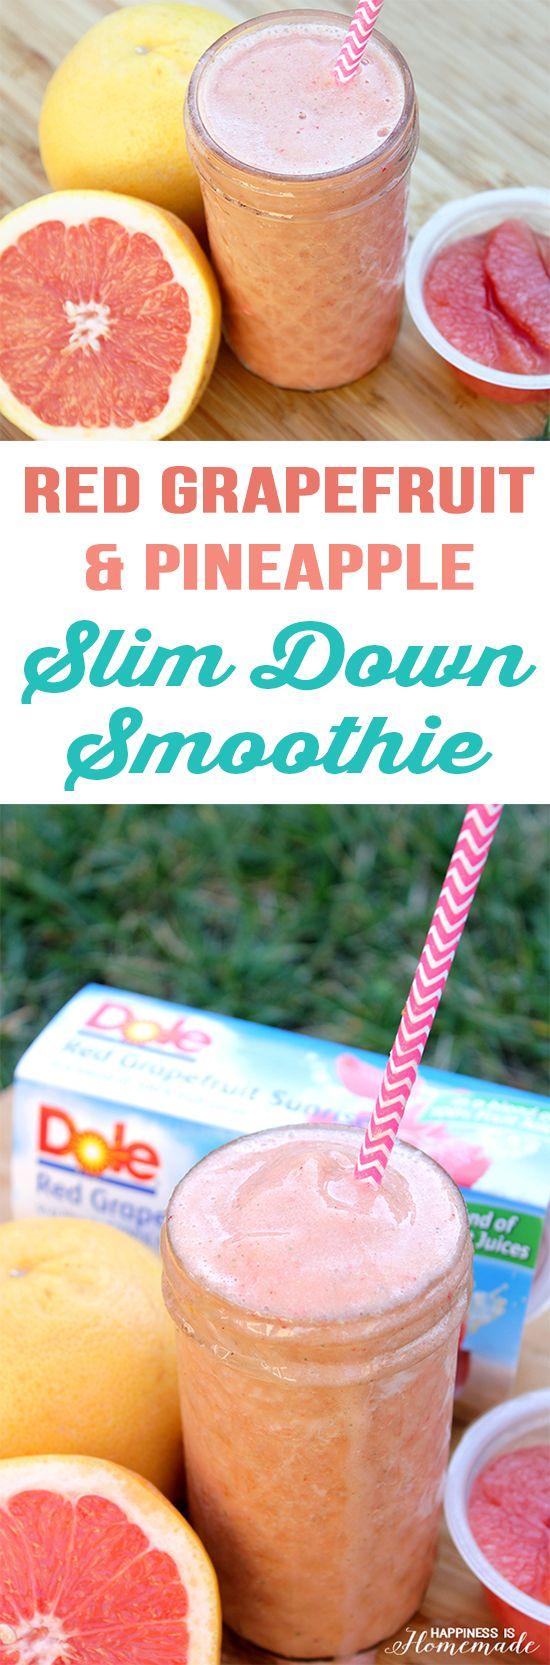 Red Grapefruit & Pineapple Slim Down Smoothie | Recipe ...